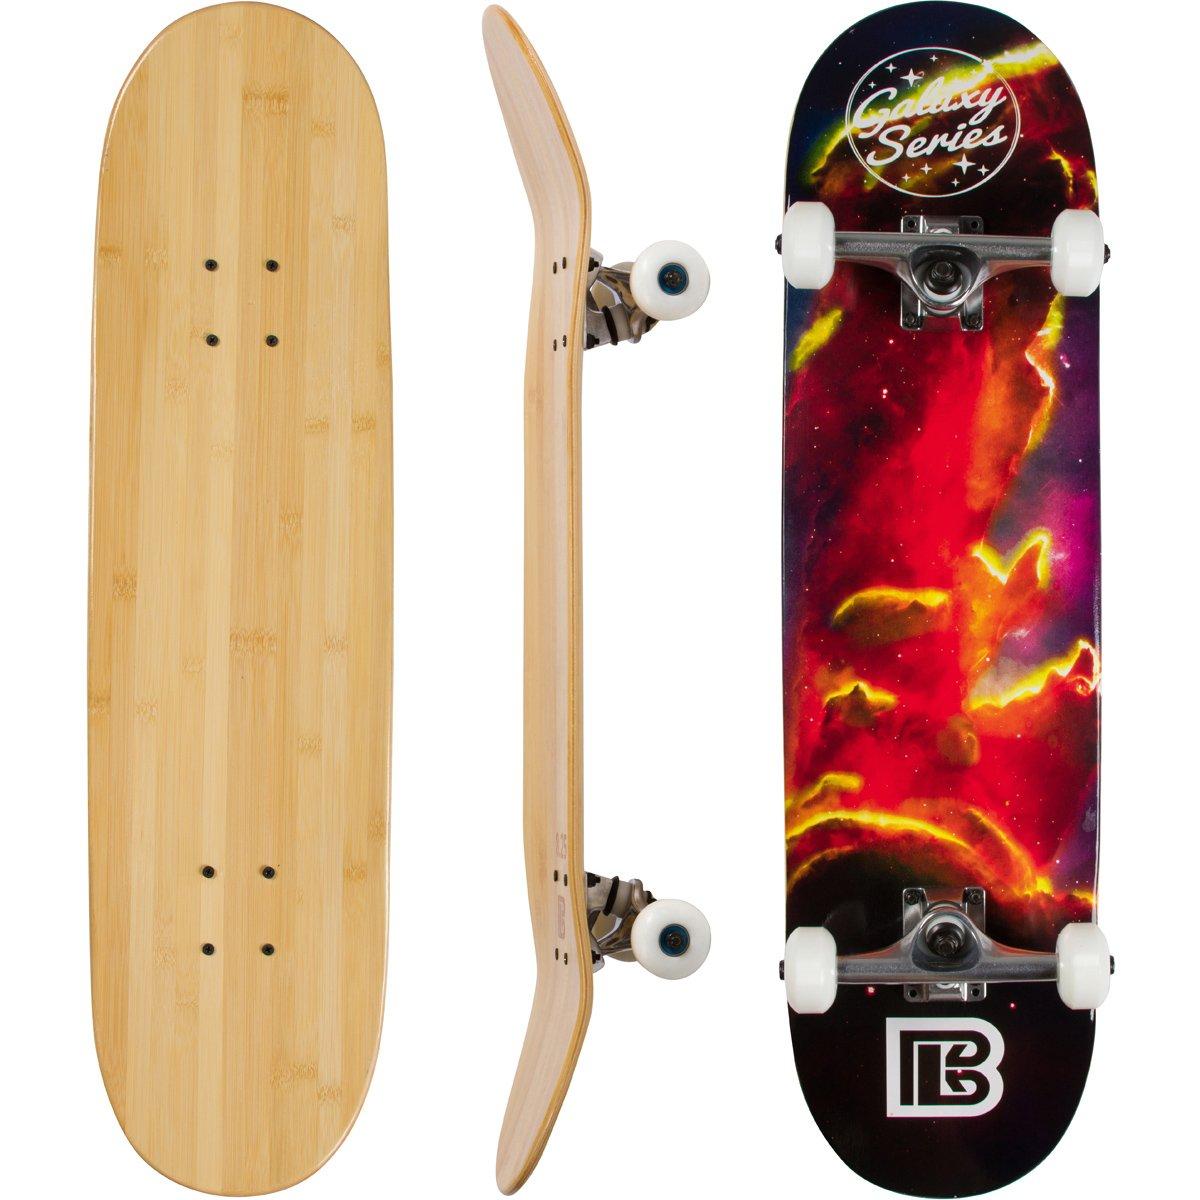 Bamboo Skateboards Complete Skateboard – More Pop, Lighter, Stronger, Lasts Longer Than Most Decks – Includes Deck, Trucks, Wheels, Hardware, ABEC 7 Bearings, Grip Tape, and Bonus Y Tool